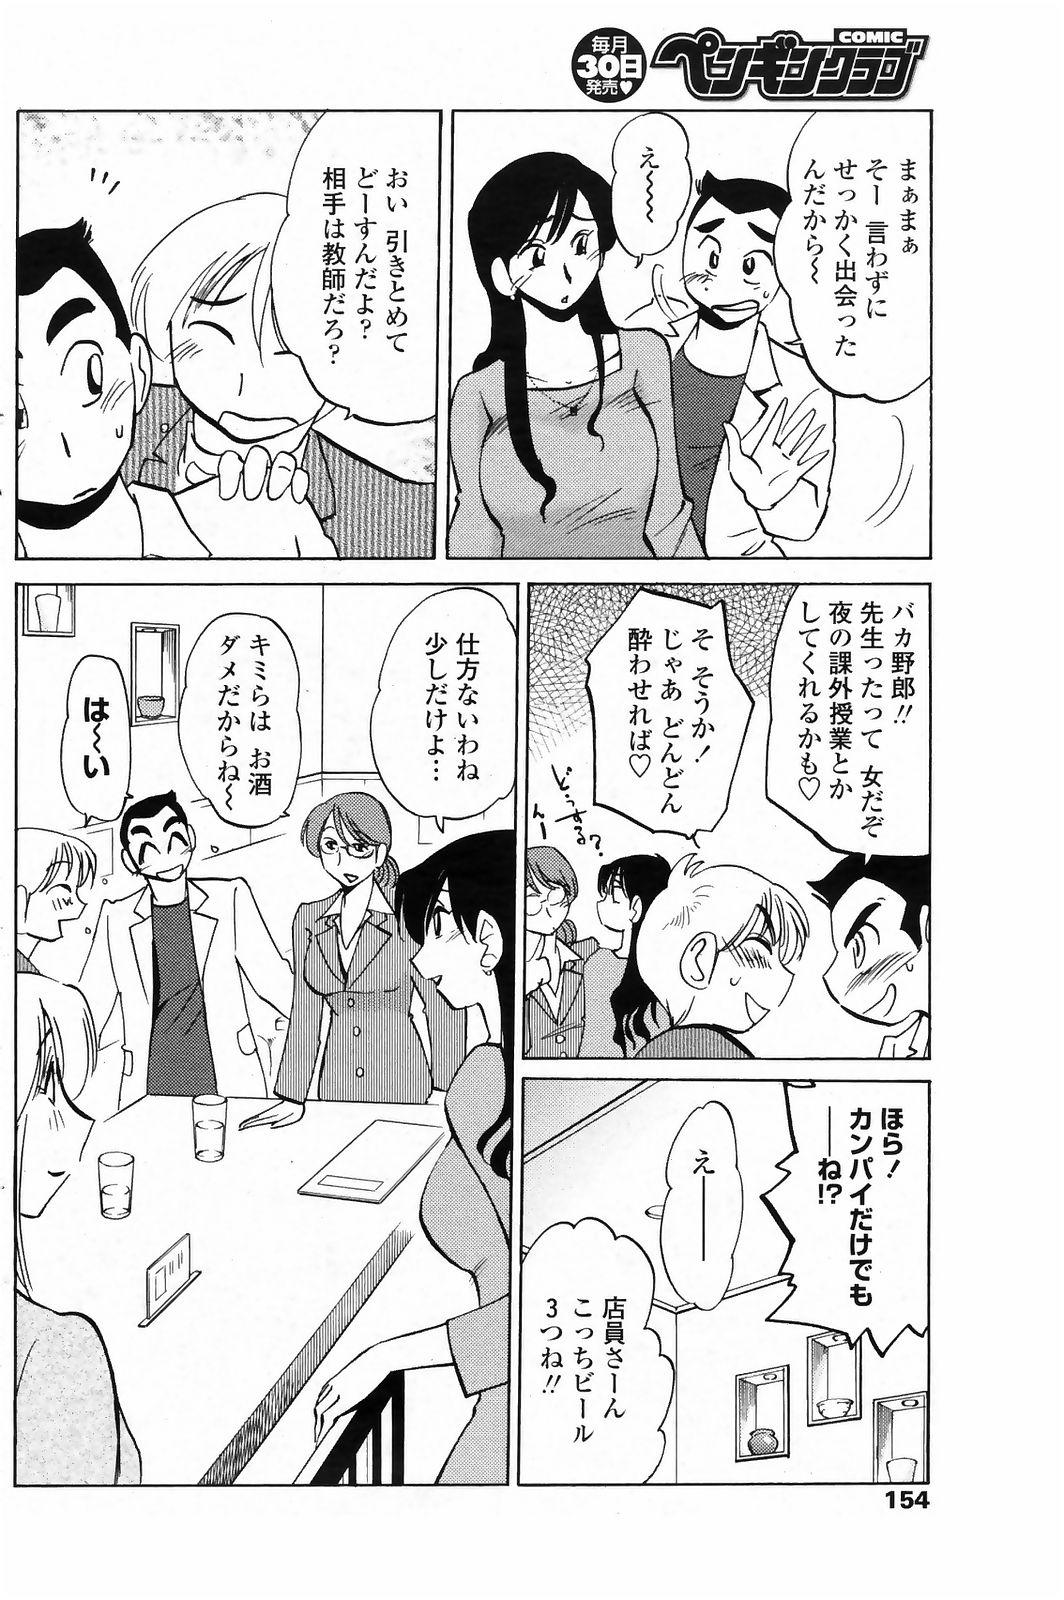 [Tsuyatsuya] Azumi-kun to Issho chapt.1-5 (Comic Penguin Club) 66